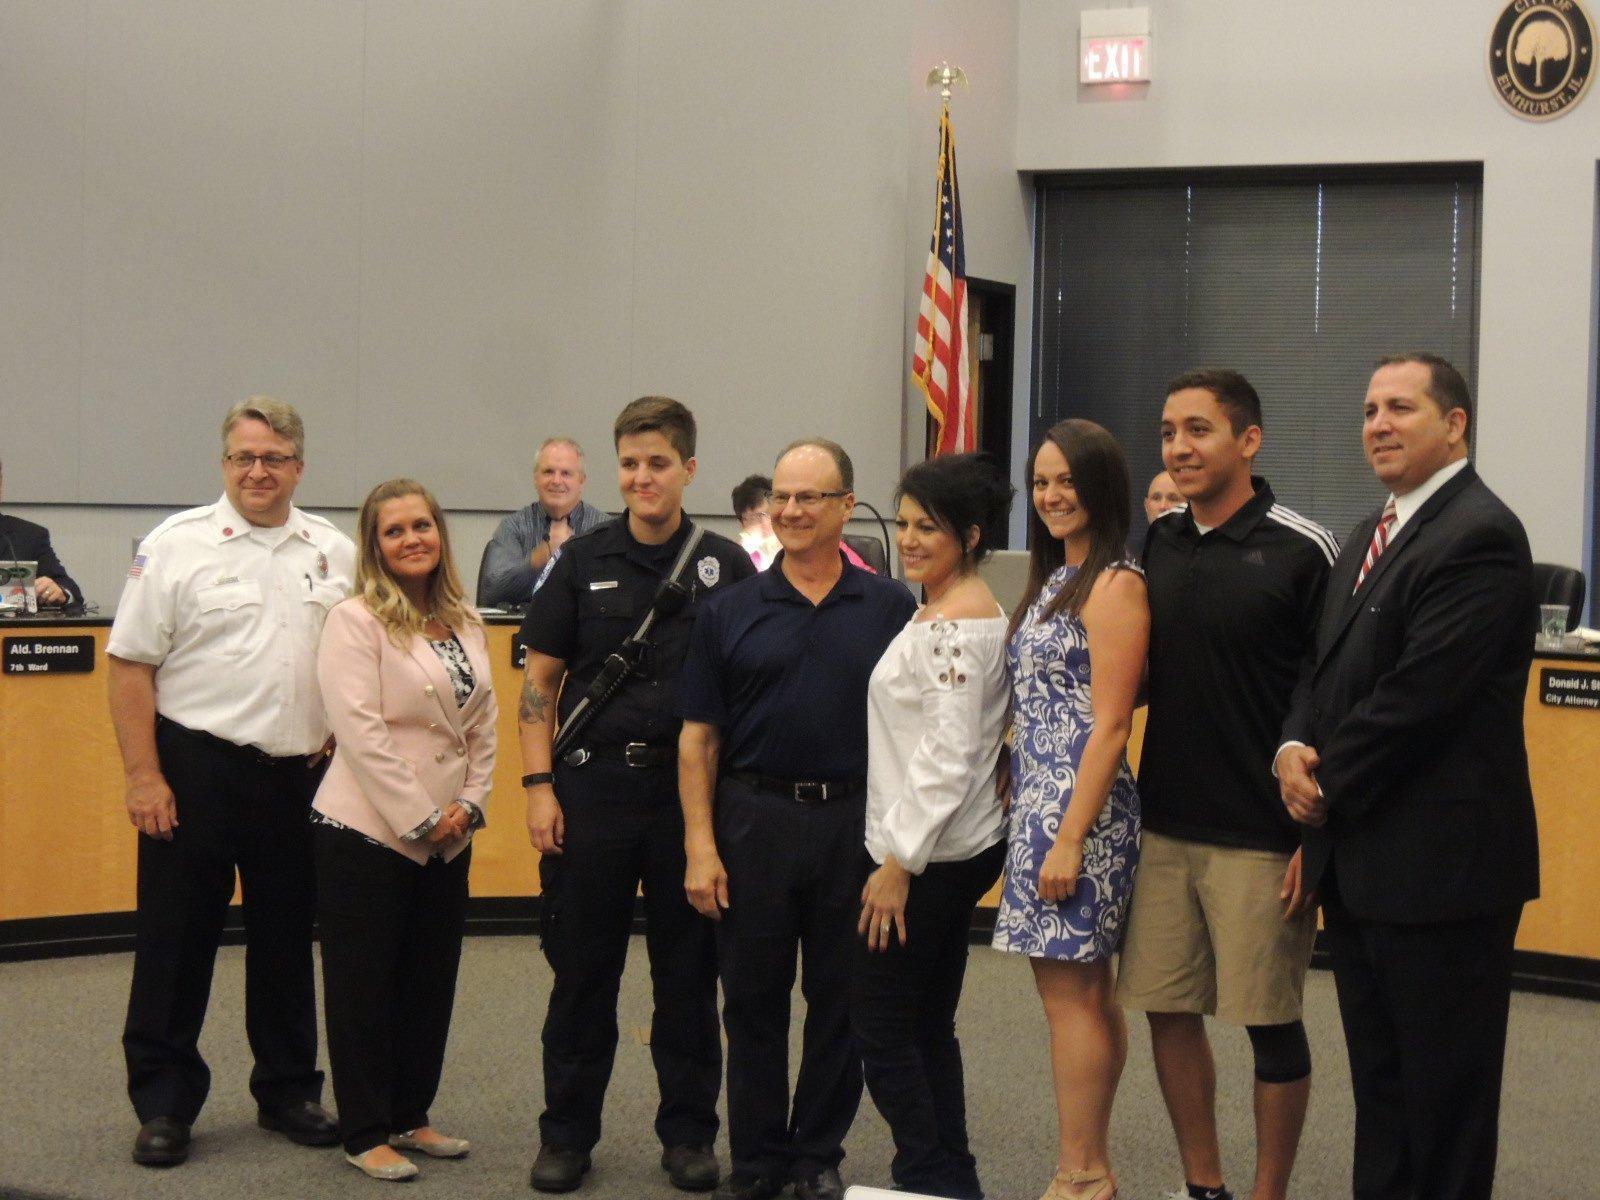 YMCA hockey player thanks Elmhurst first responders for saving his life